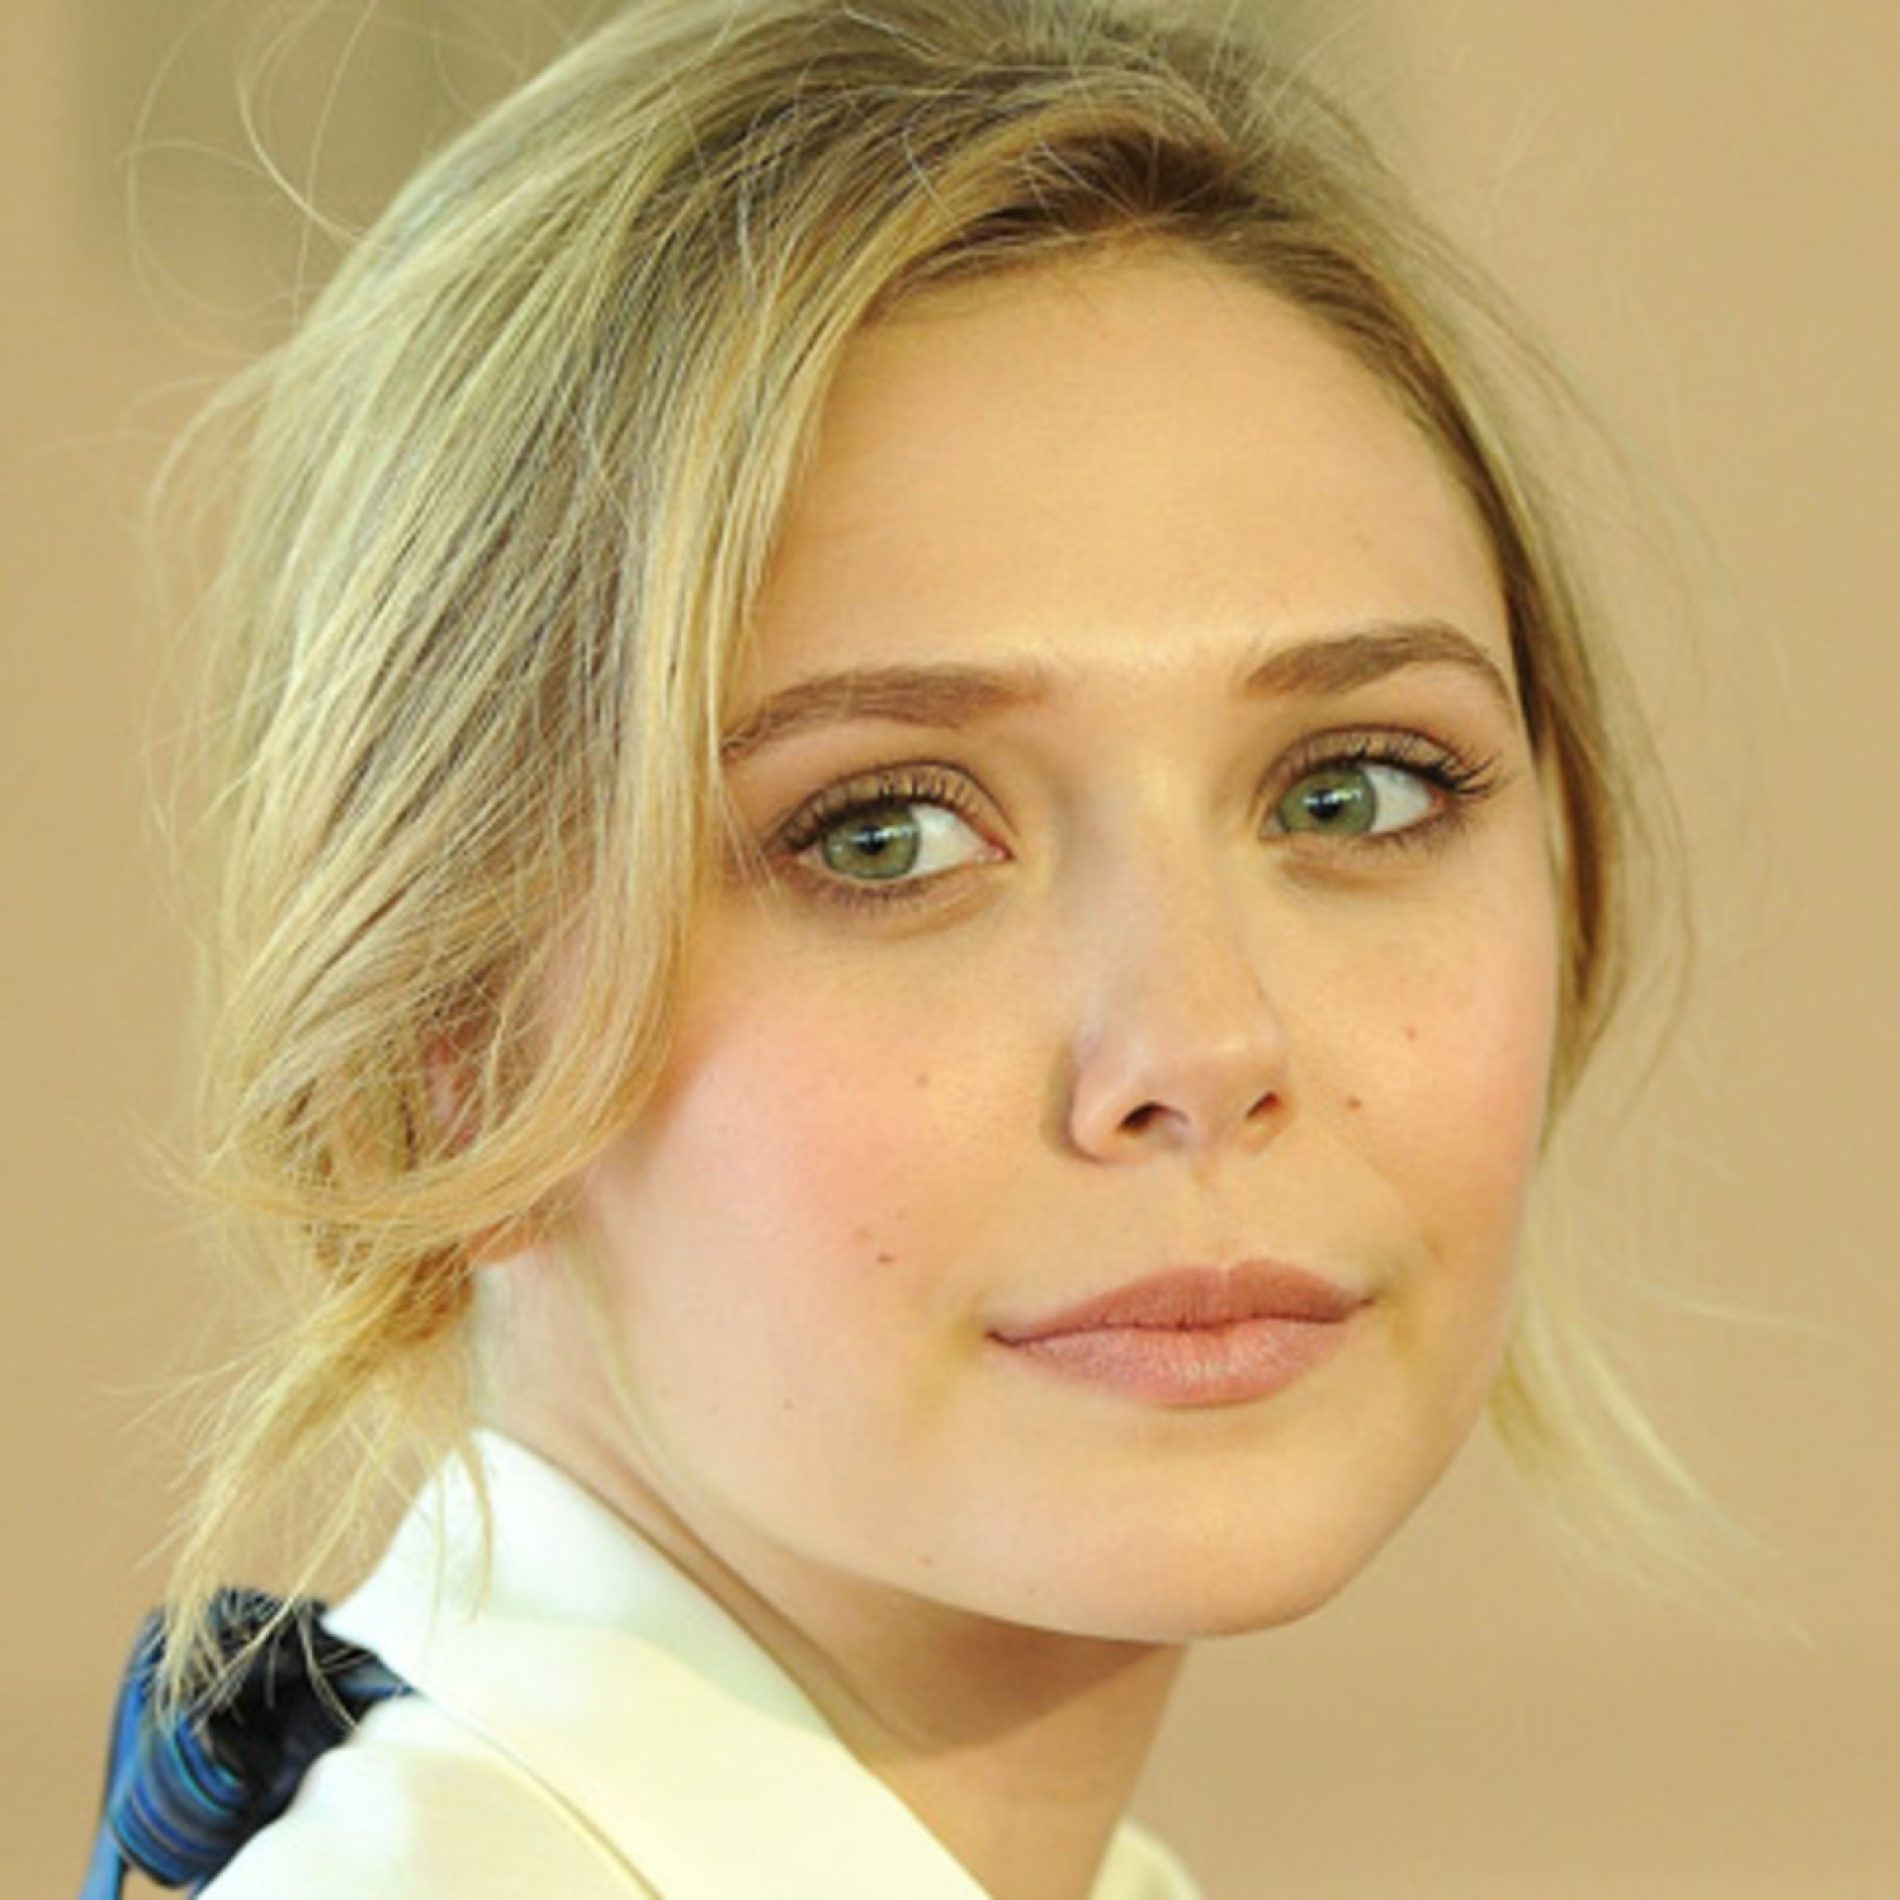 Poznata glumica Elizabeth Olsen o Srbiji –  Niko nema razloga da ide tamo